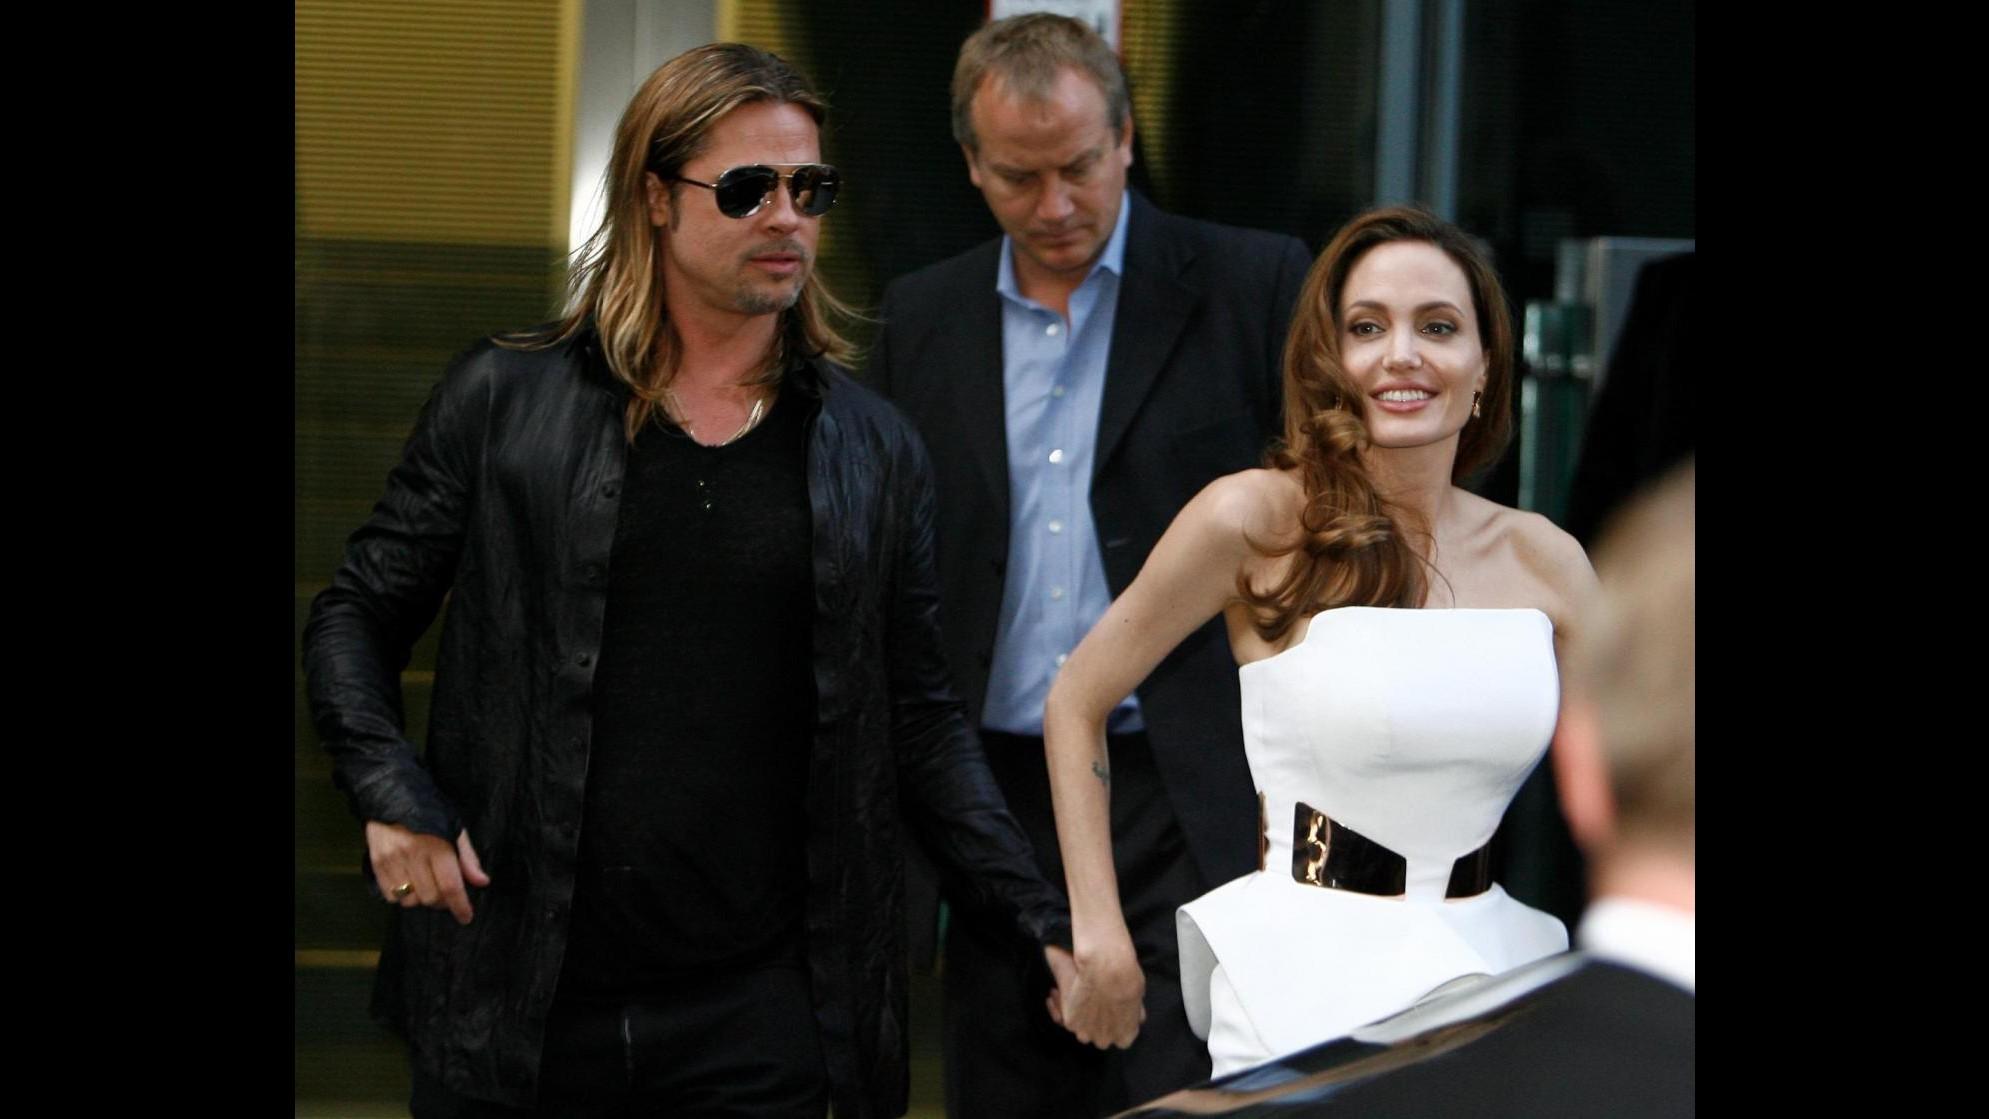 Brad Pitt dà 700 dollari di mancia a cameriera ristorante a Berlino